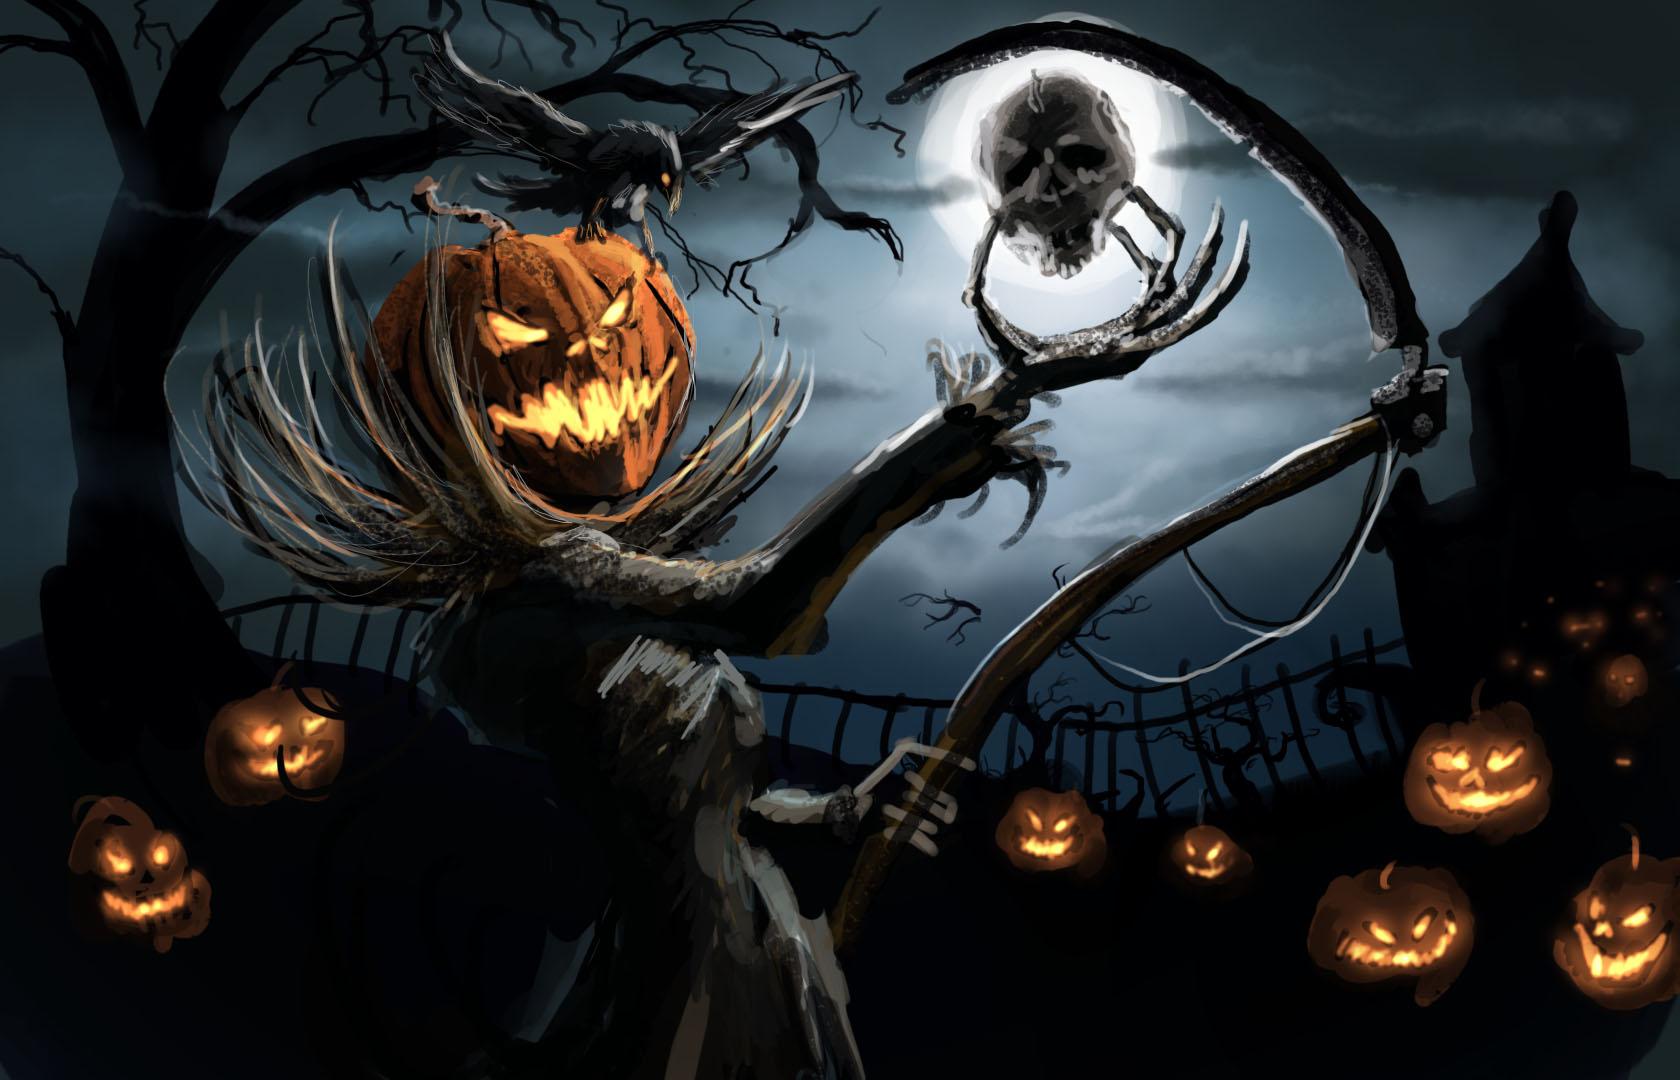 48+] Evil Halloween Wallpaper on WallpaperSafari